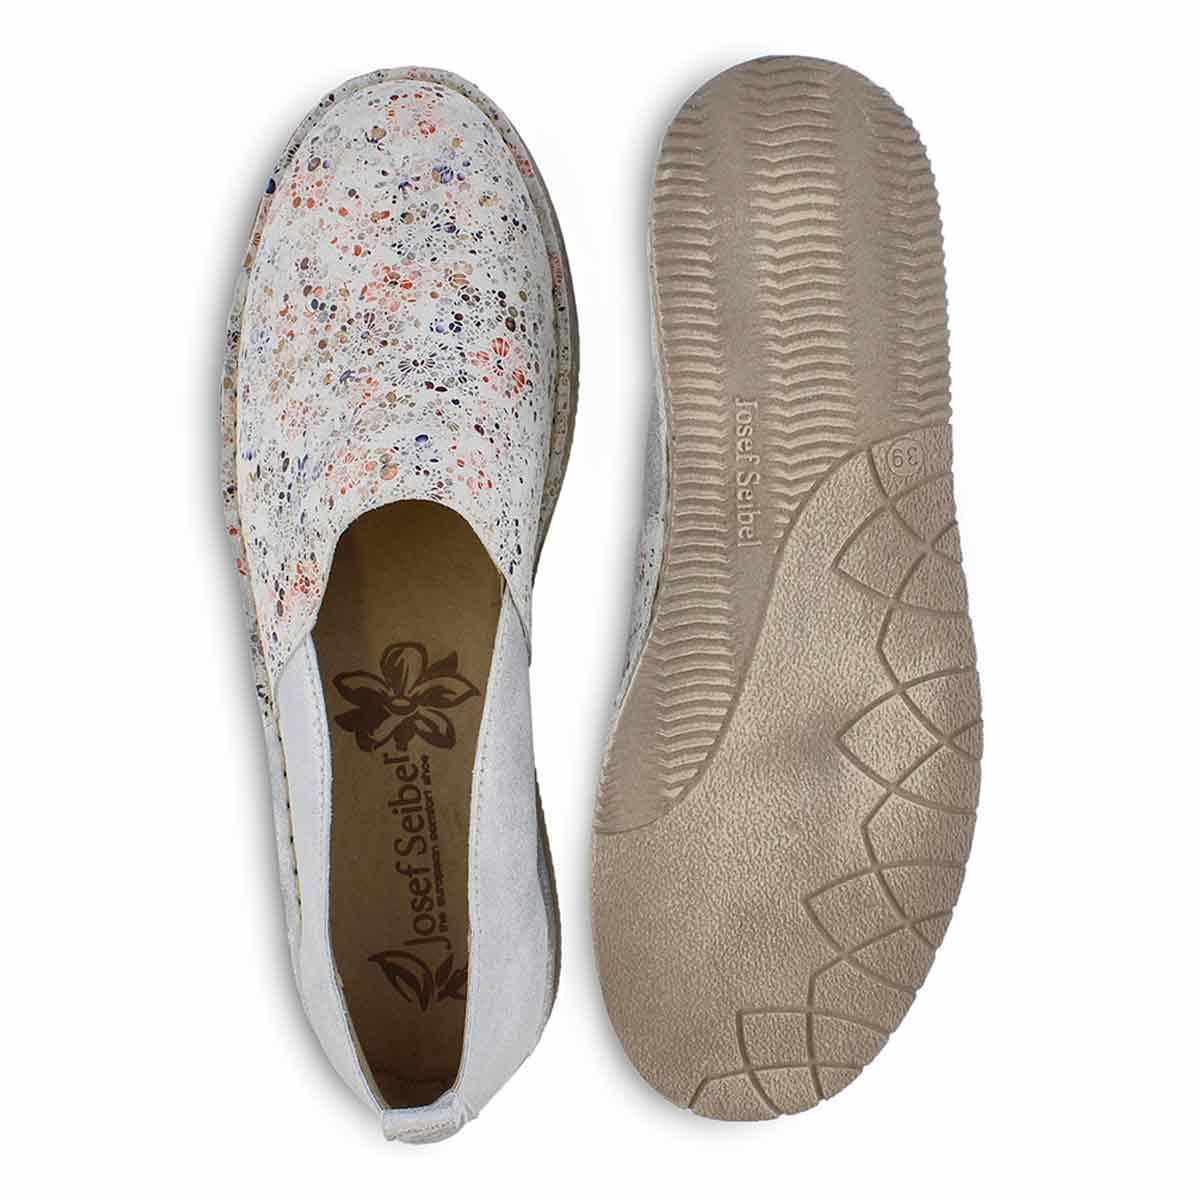 Lds Sofie 33 white slip on shoe